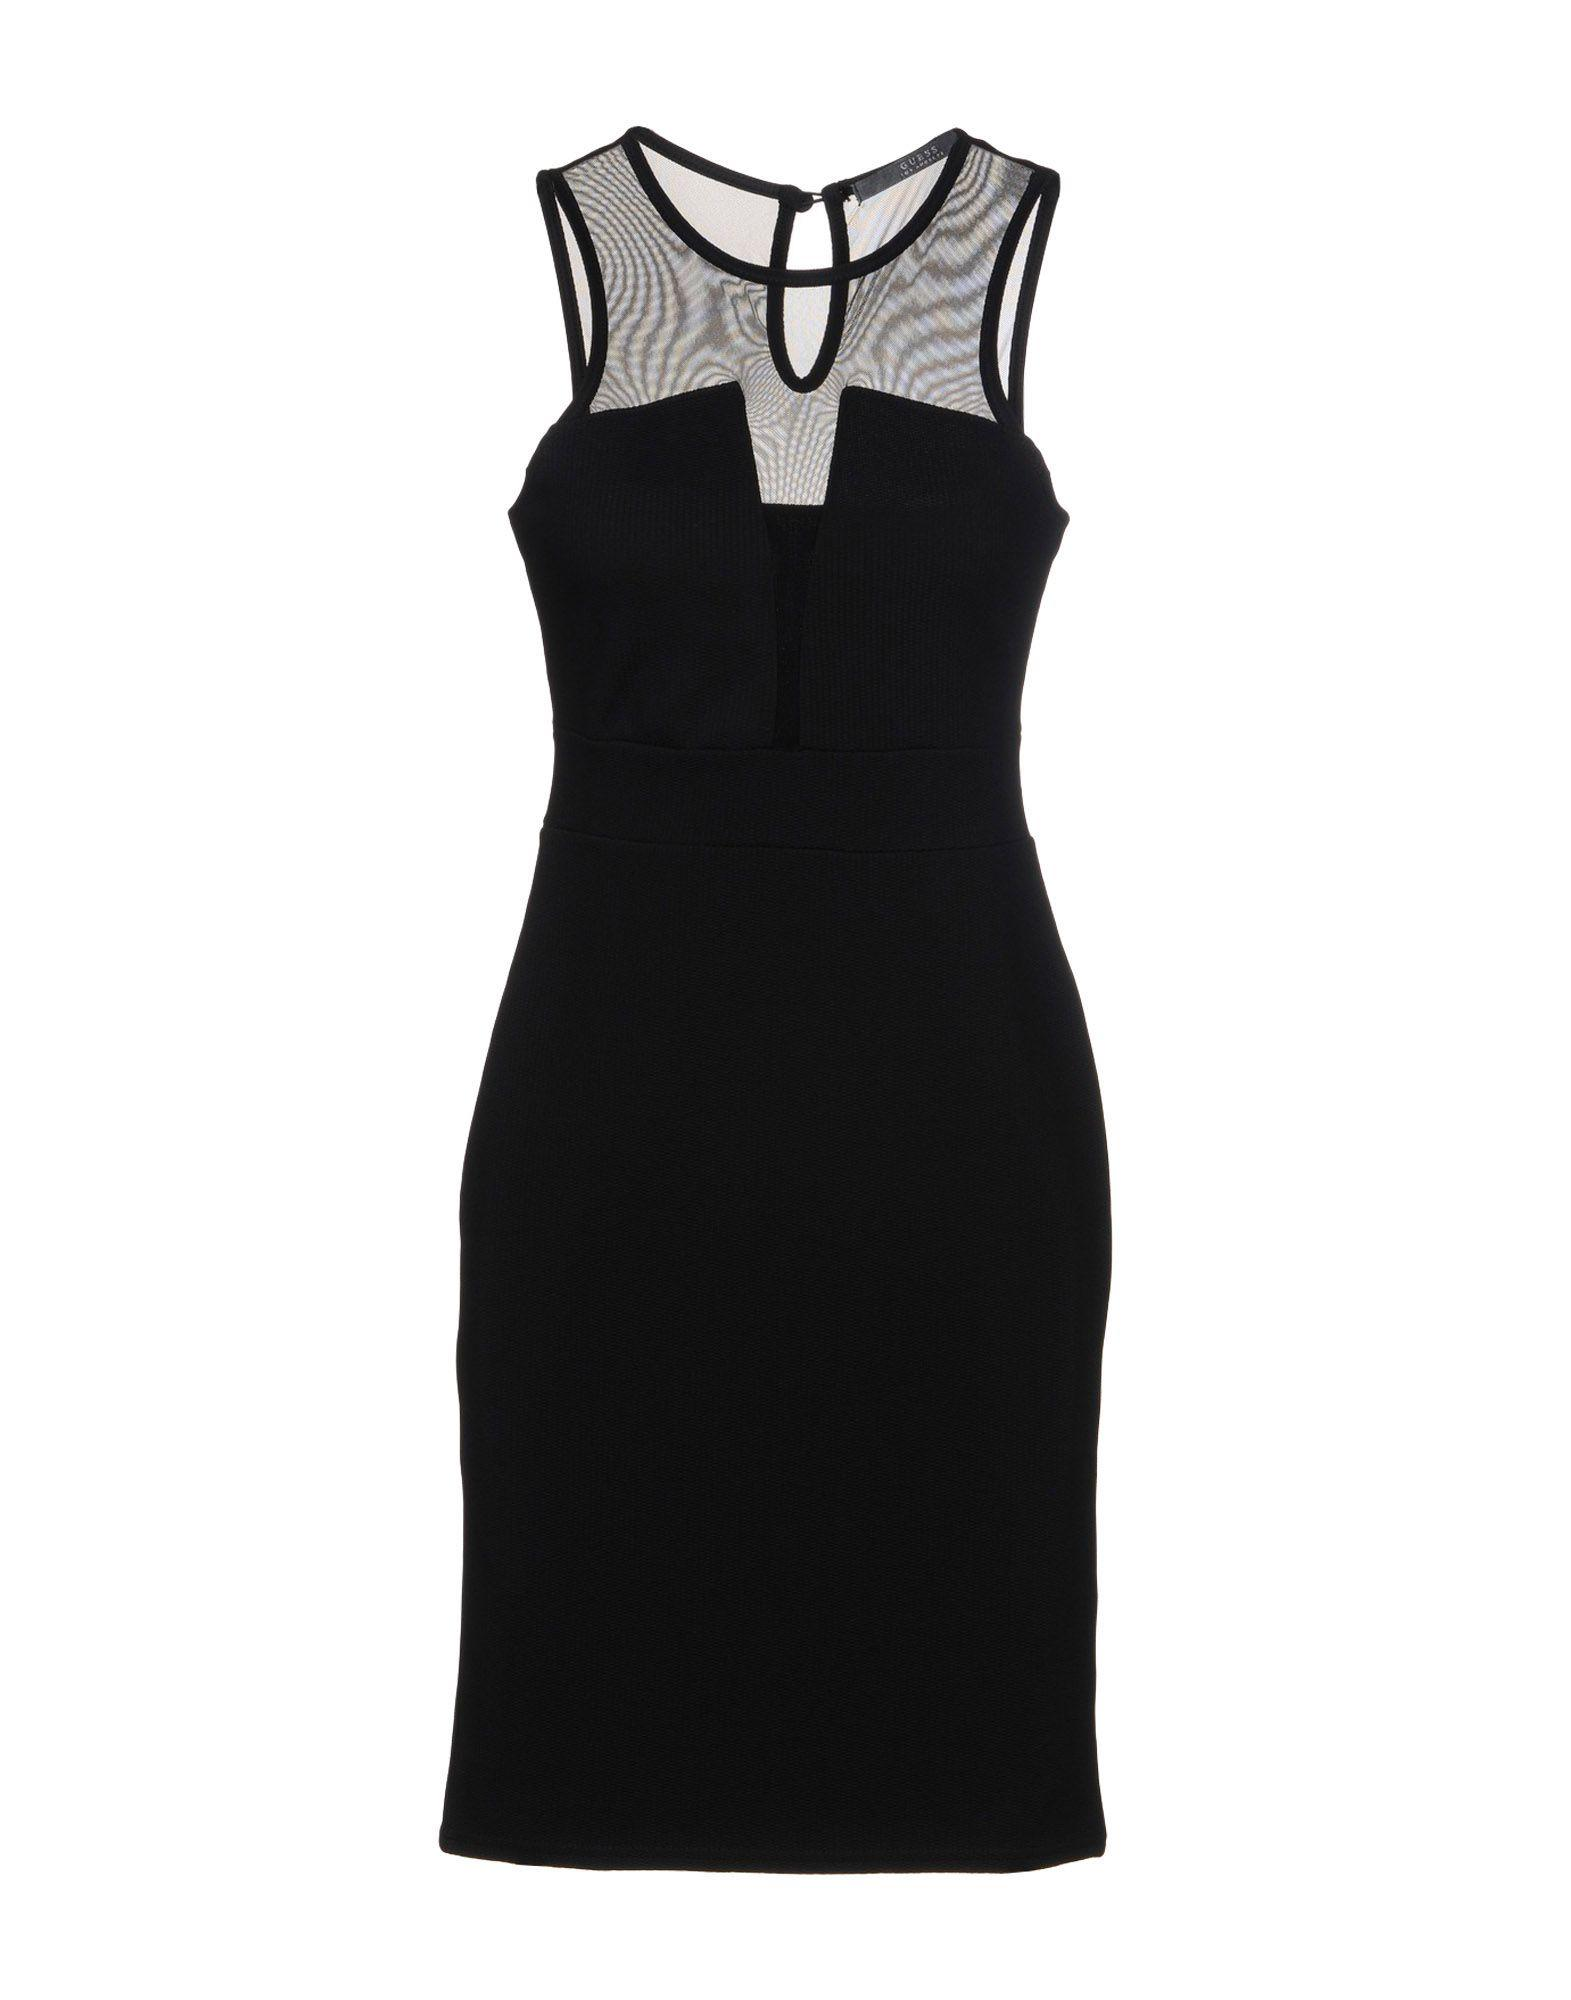 Guess Short Dress In Black